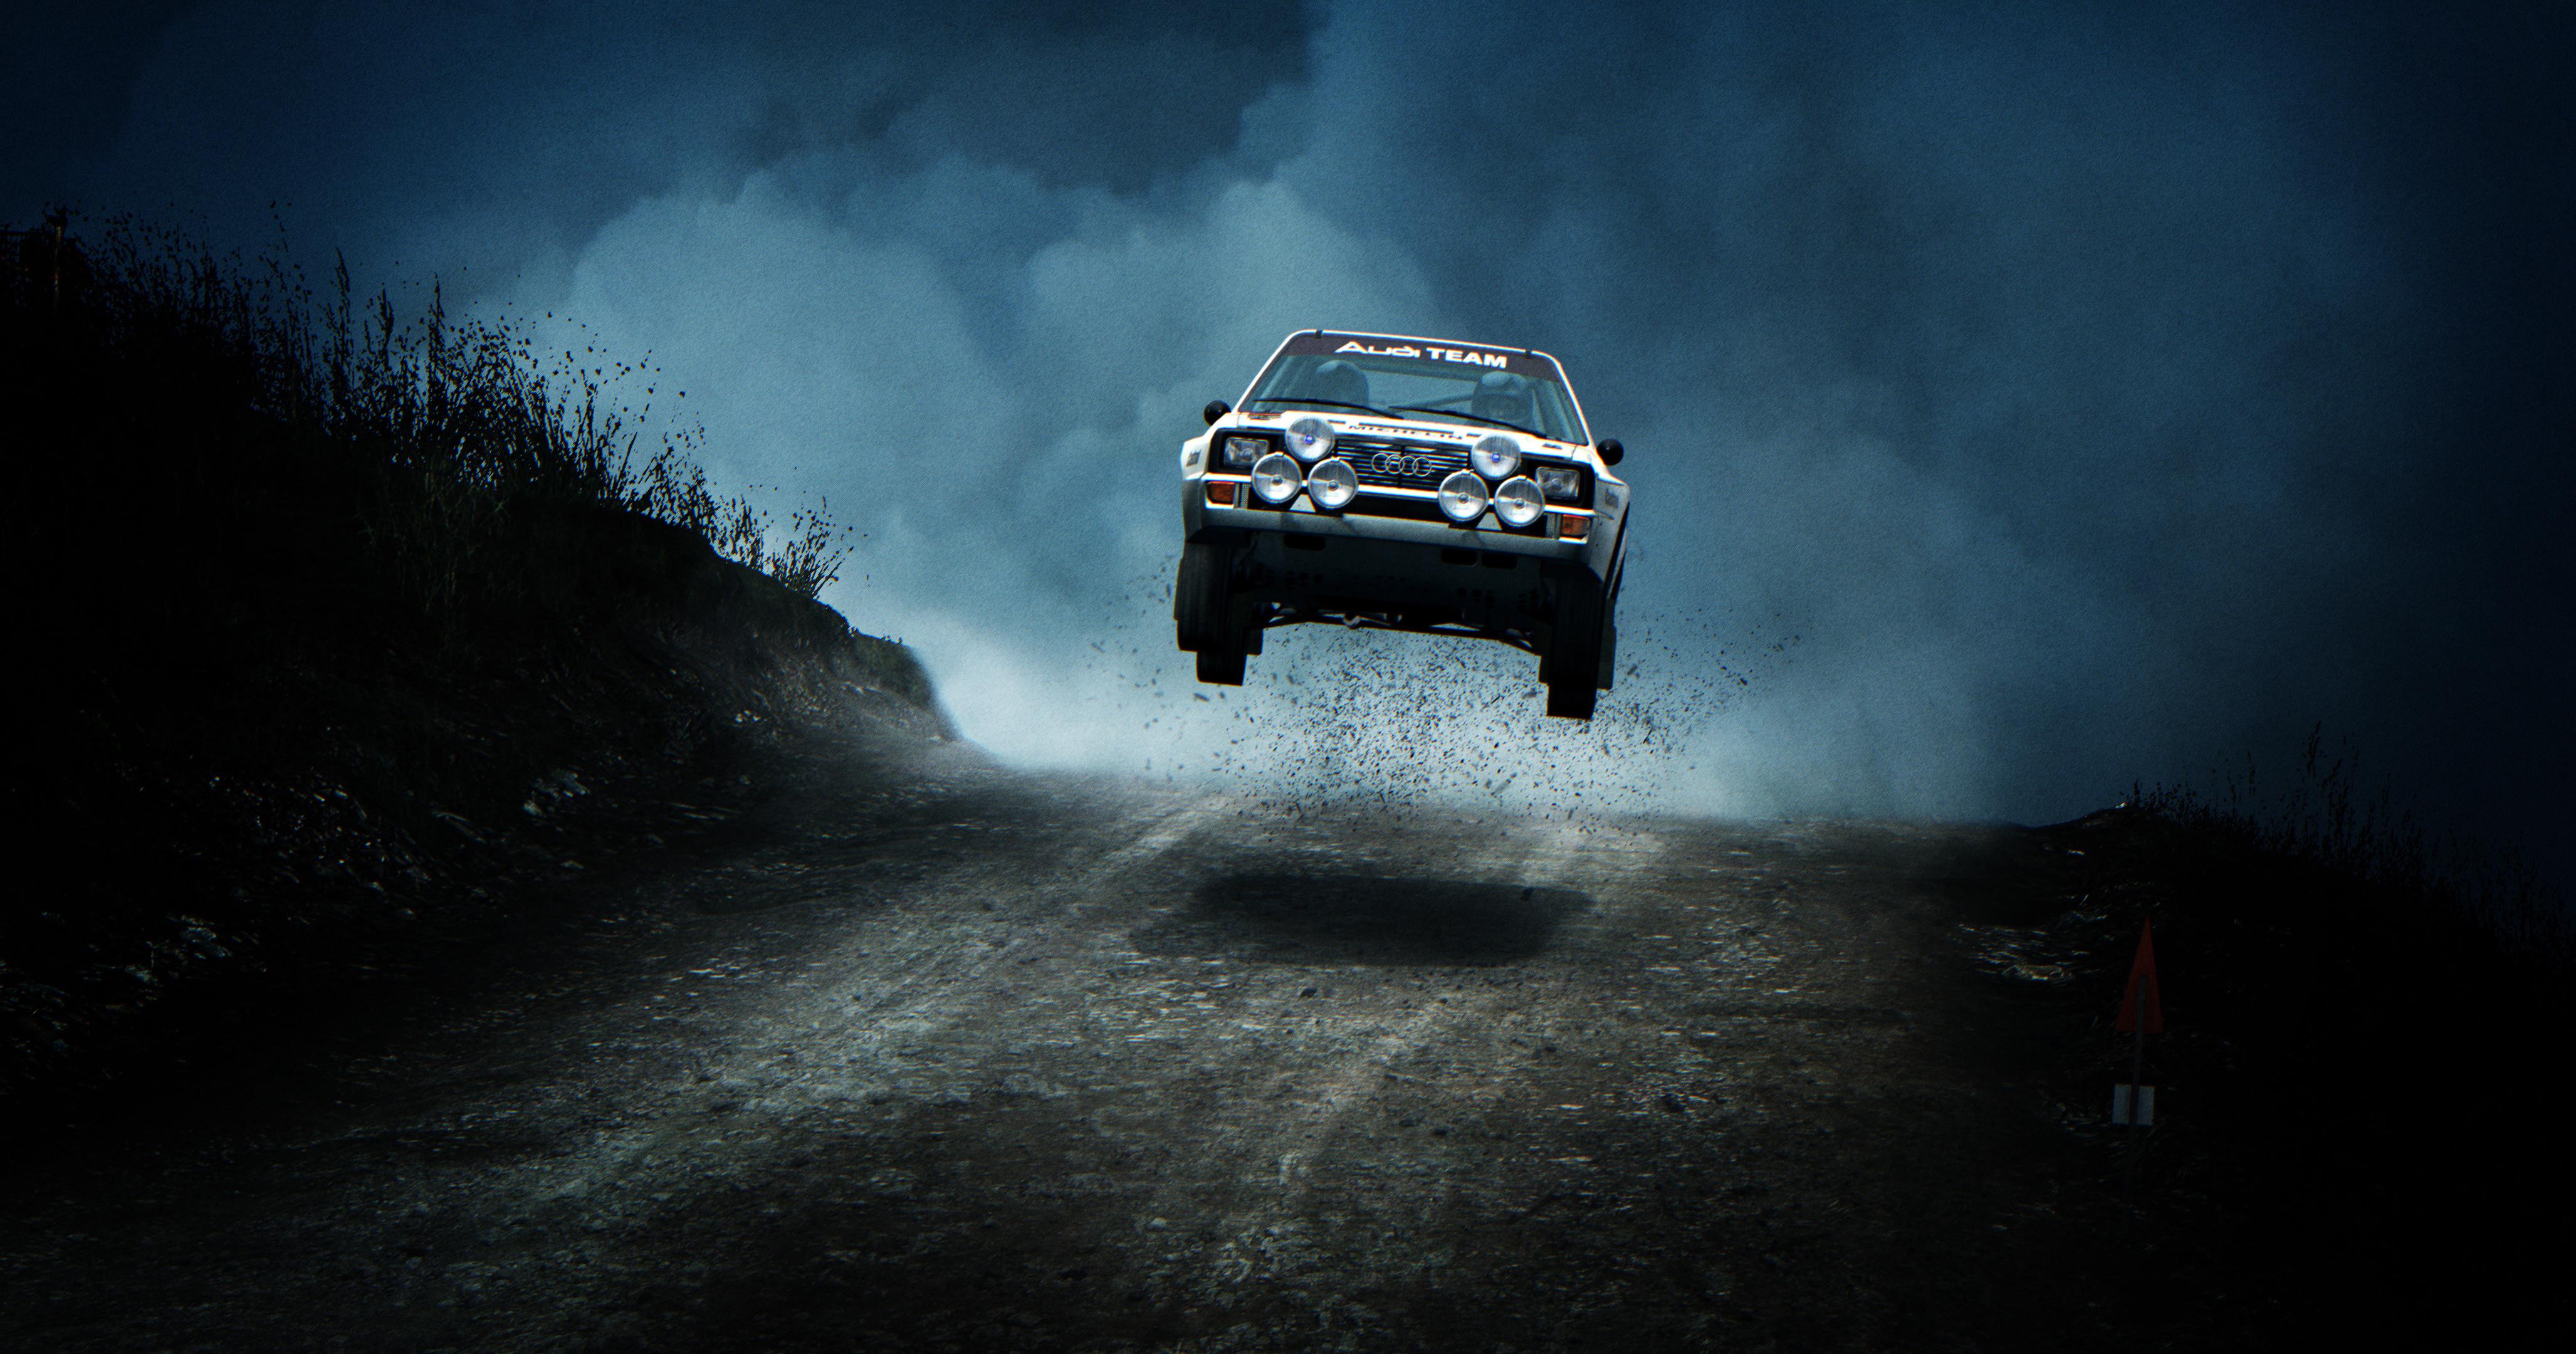 Race Track Wall Art >> DiRT Rally 4k Ultra HD Fond d'écran and Arrière-plan ...